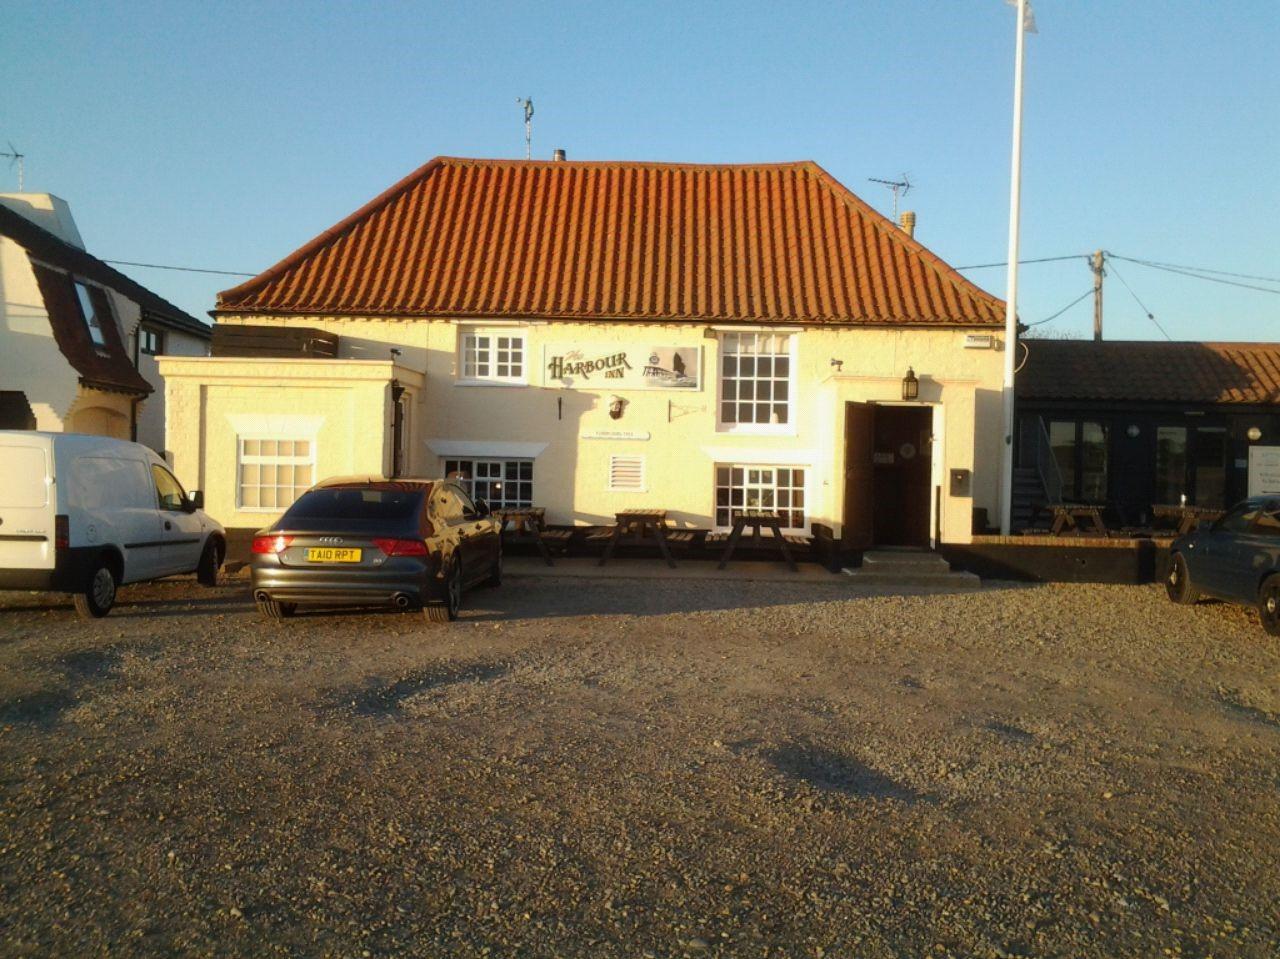 De pub aan de Blyth